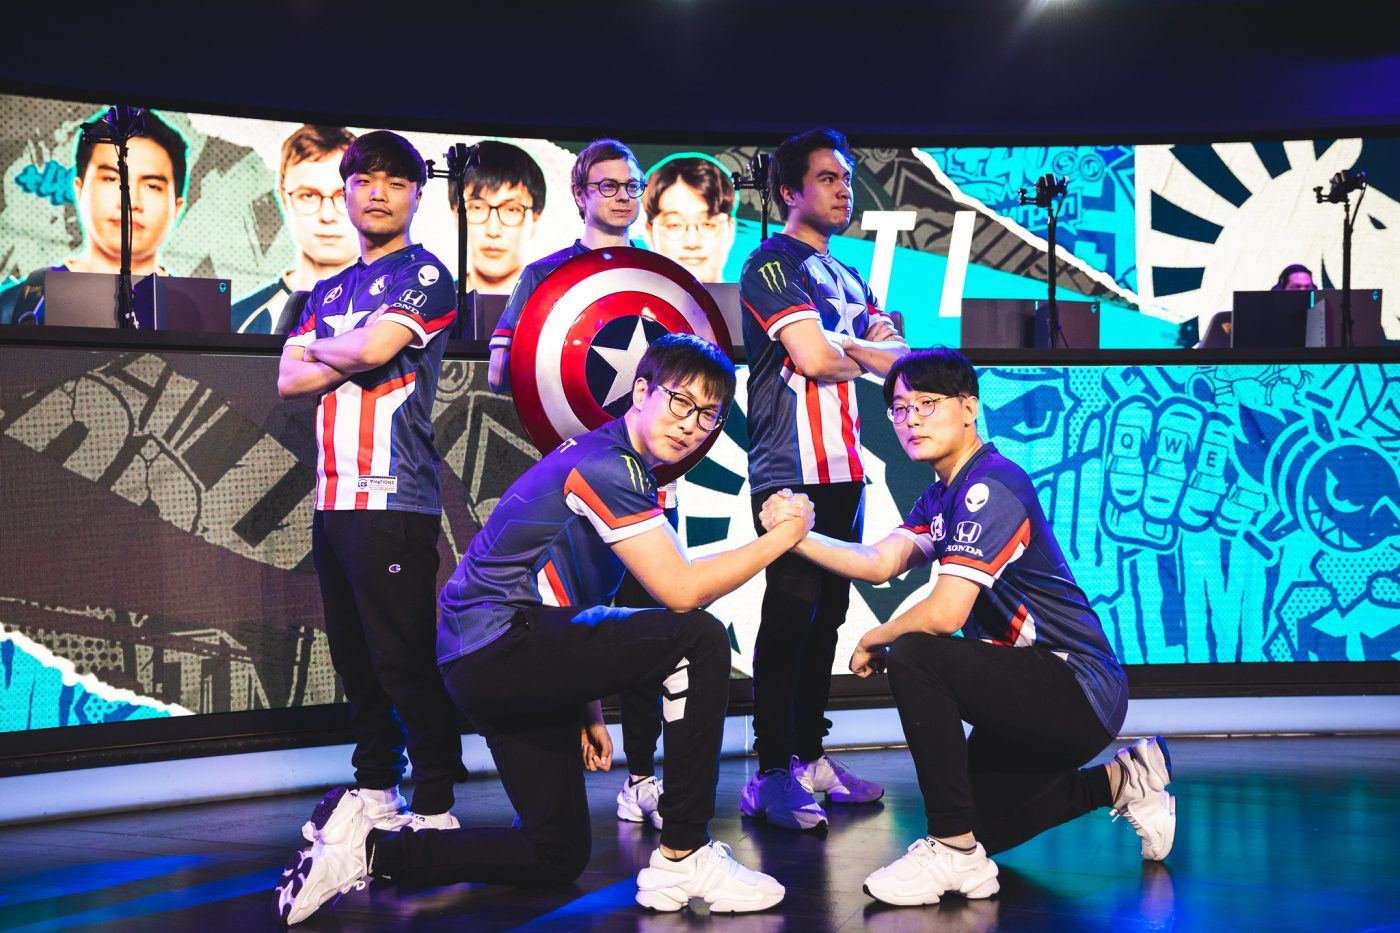 Team Liquid pose with Captain America shield